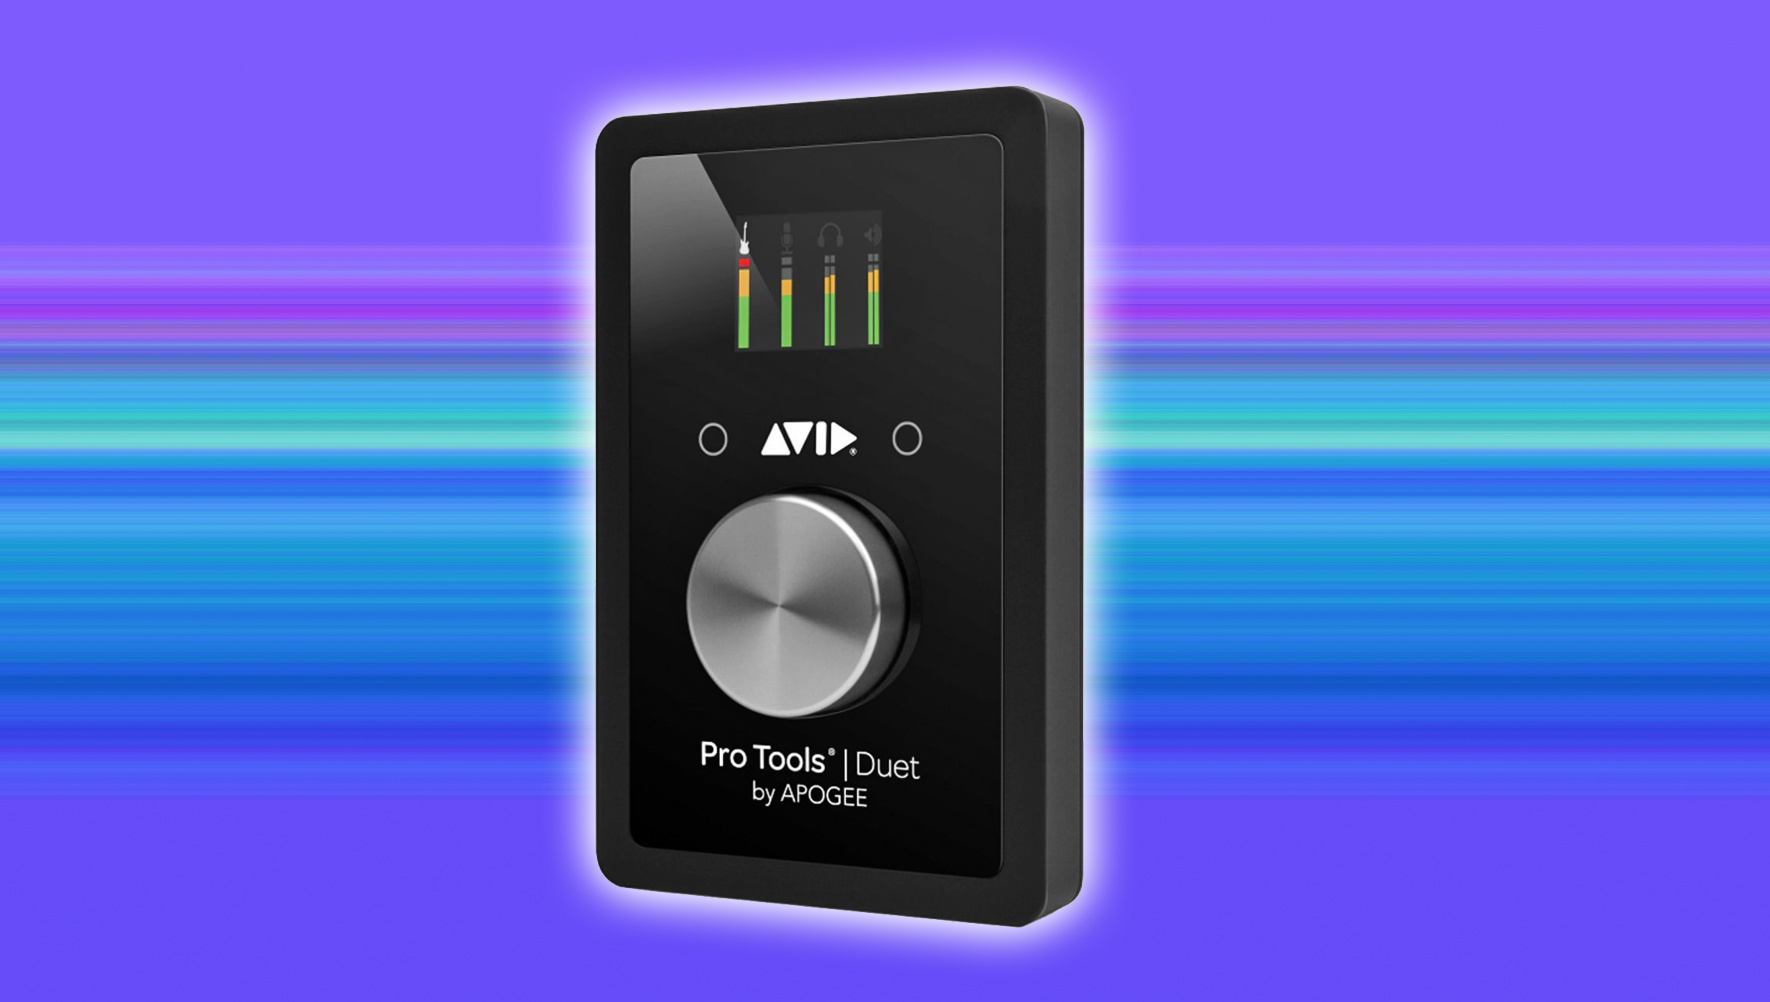 Test: USB-Audio-Interface Avid Pro Tools Duet